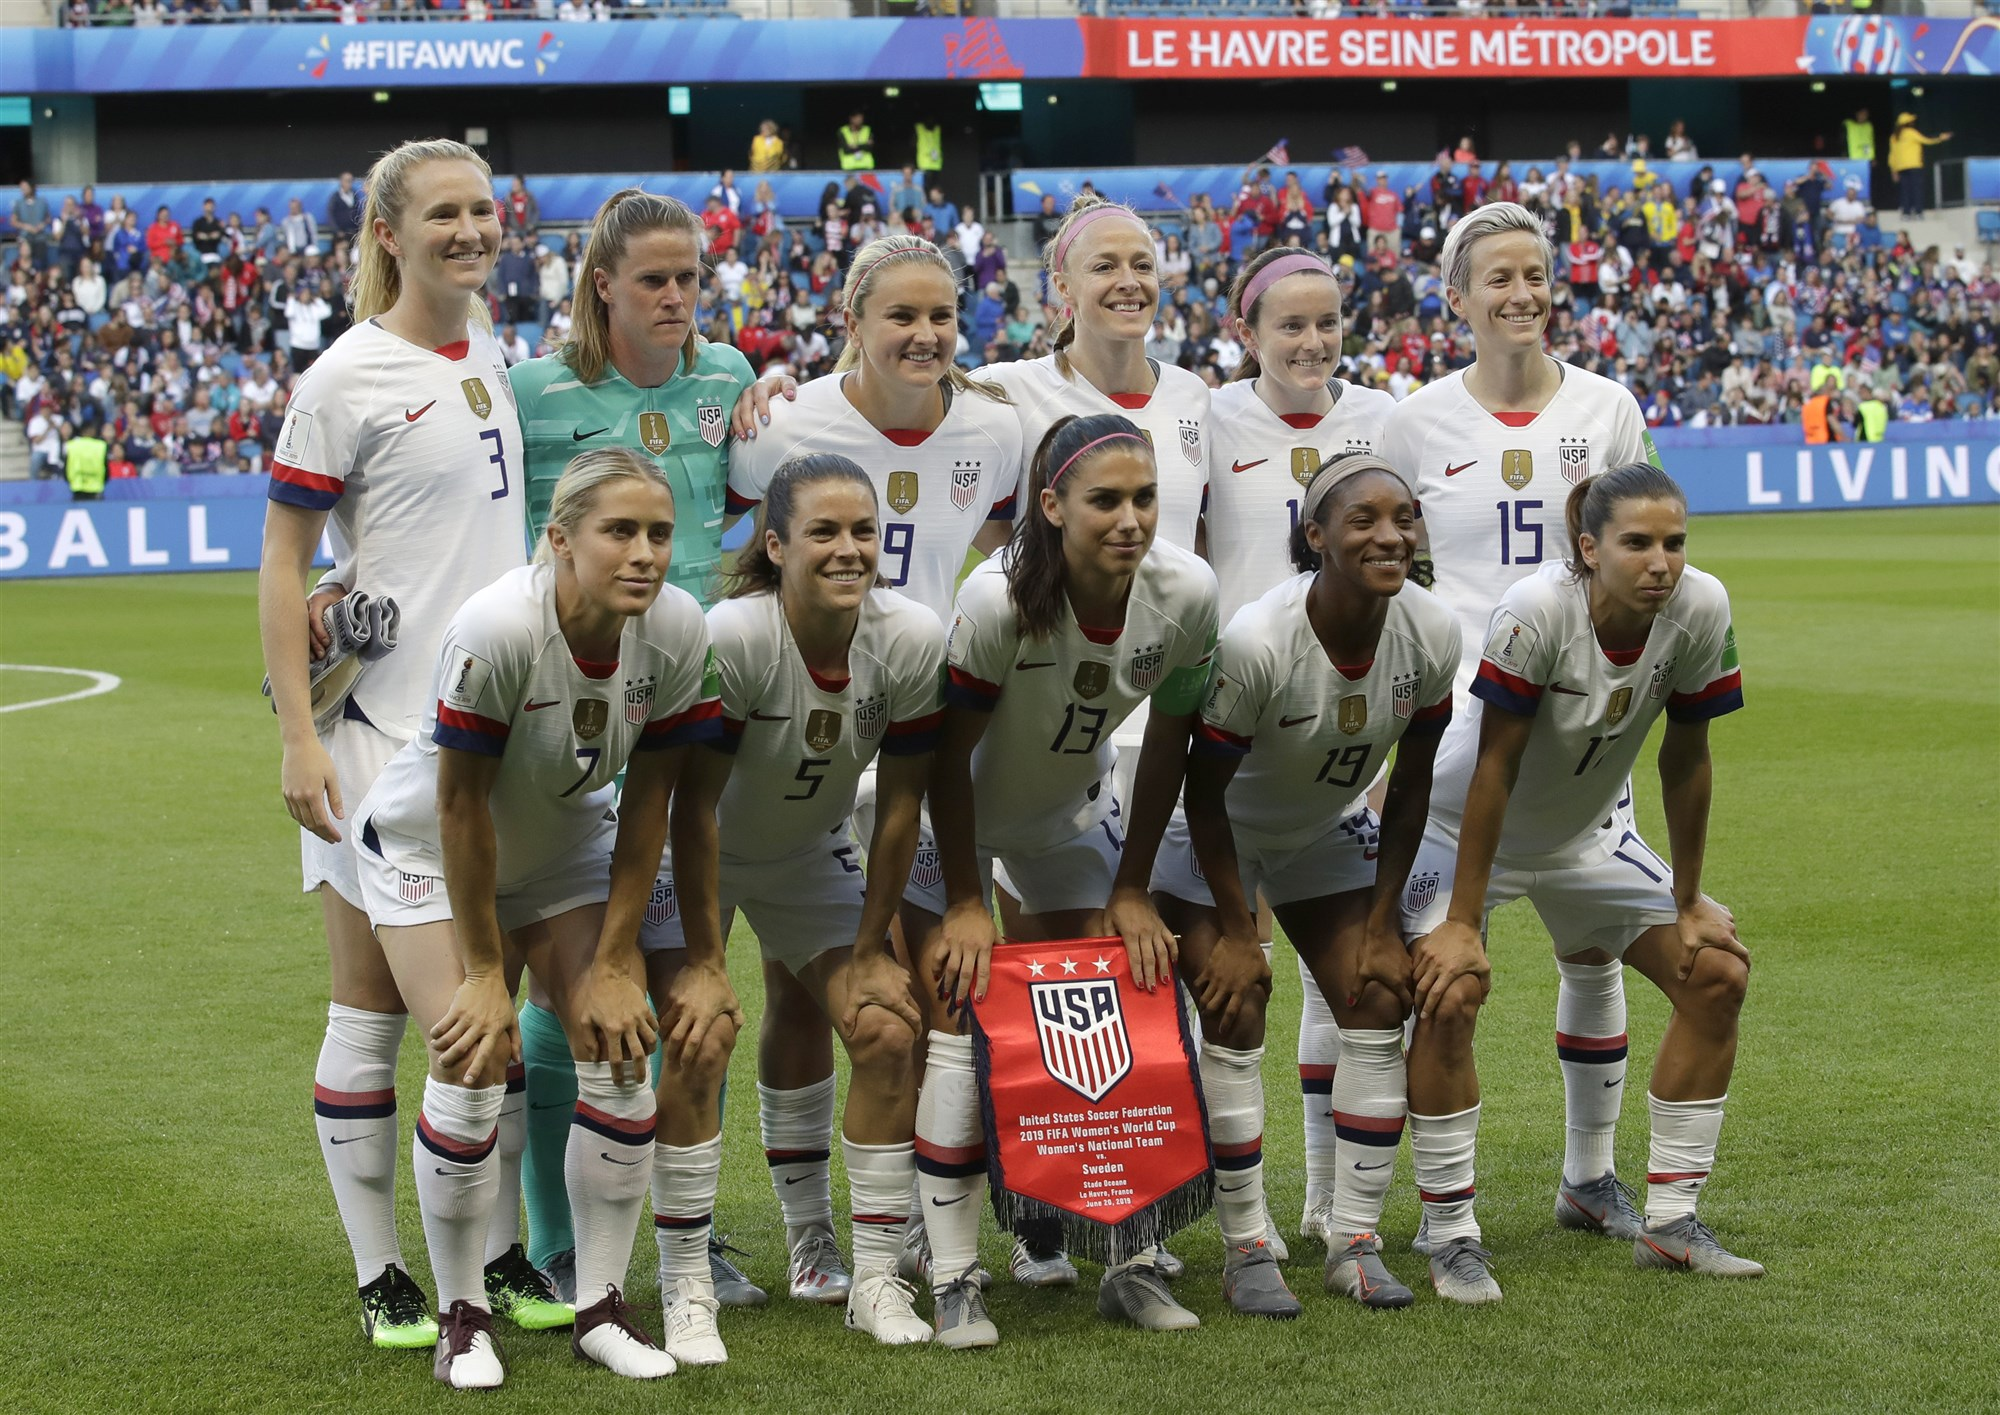 womens football teams arrive - HD3810×2695